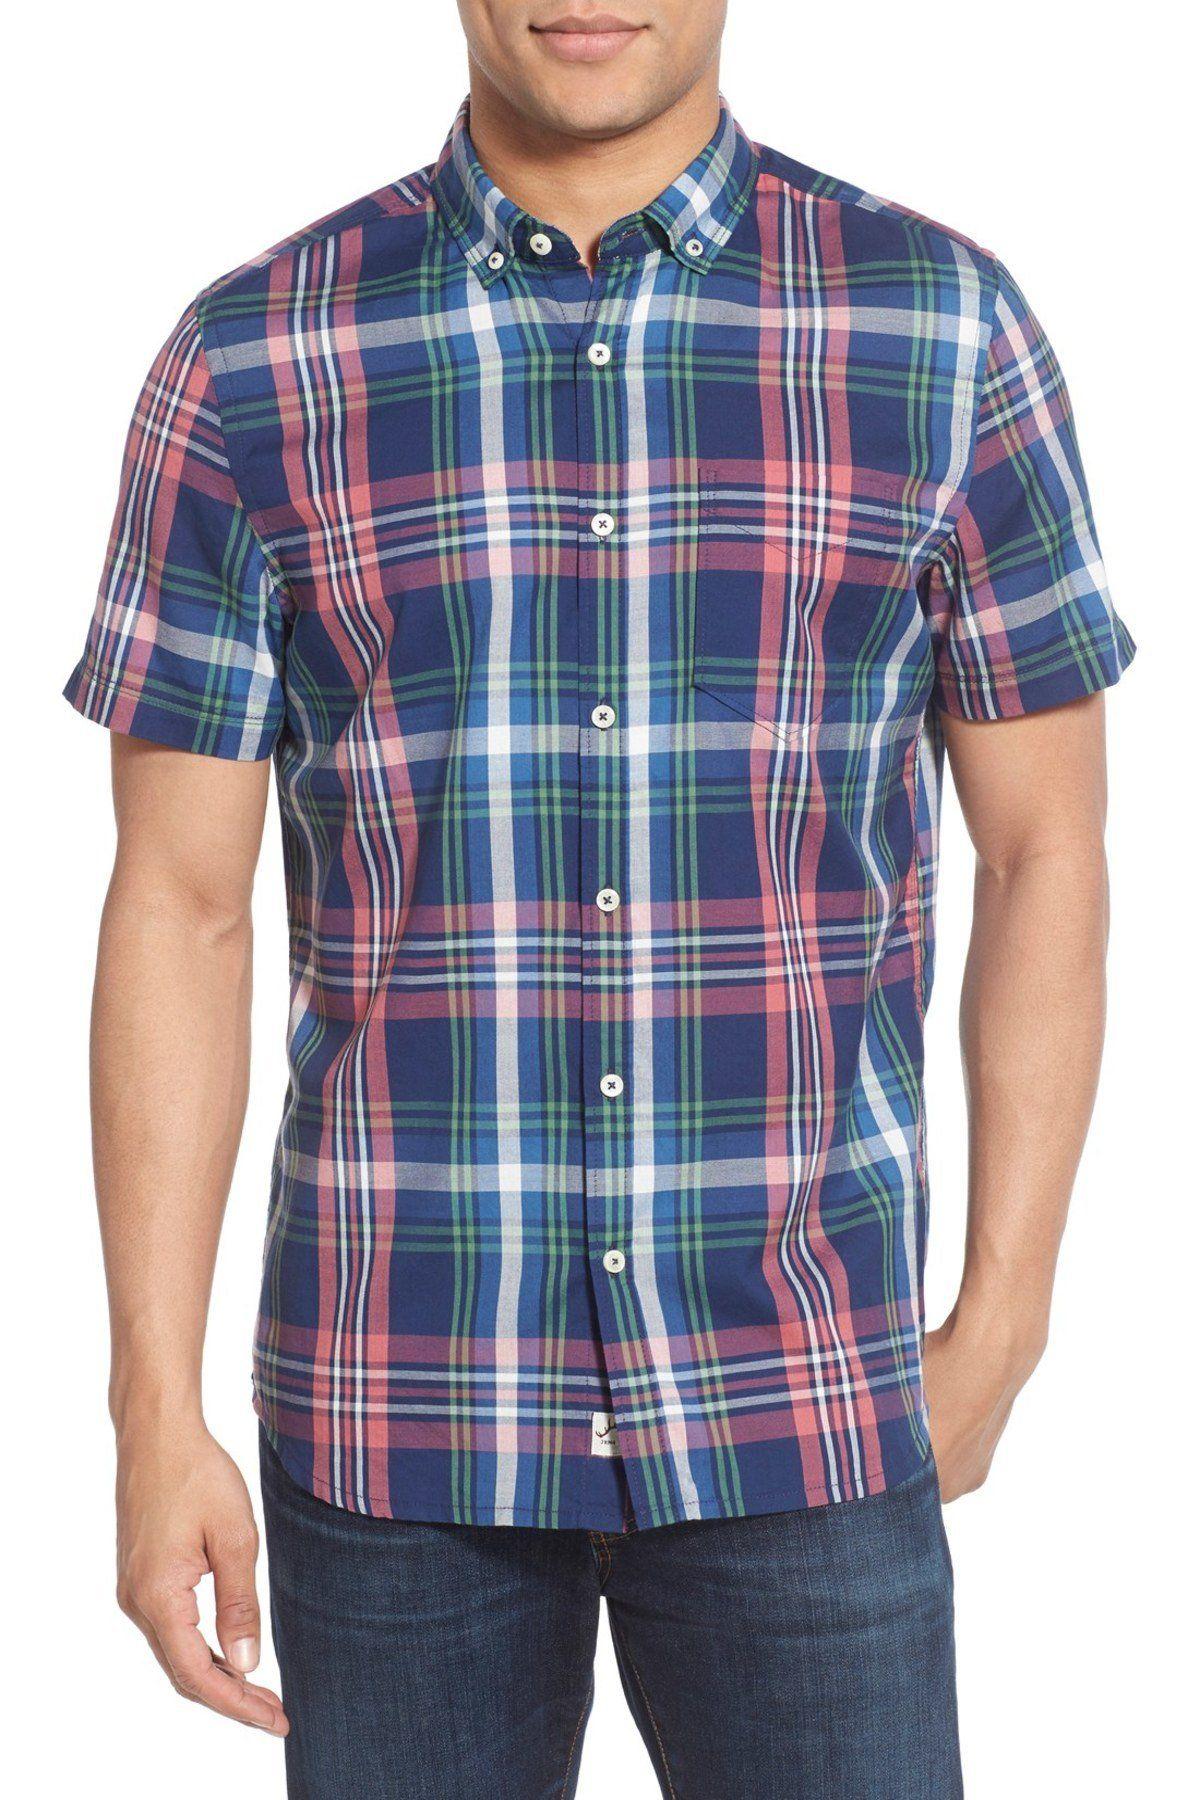 Flannel shirt apron  Brent Madras Plaid Sport Short Sleeve Regular Fit Shirt  Products